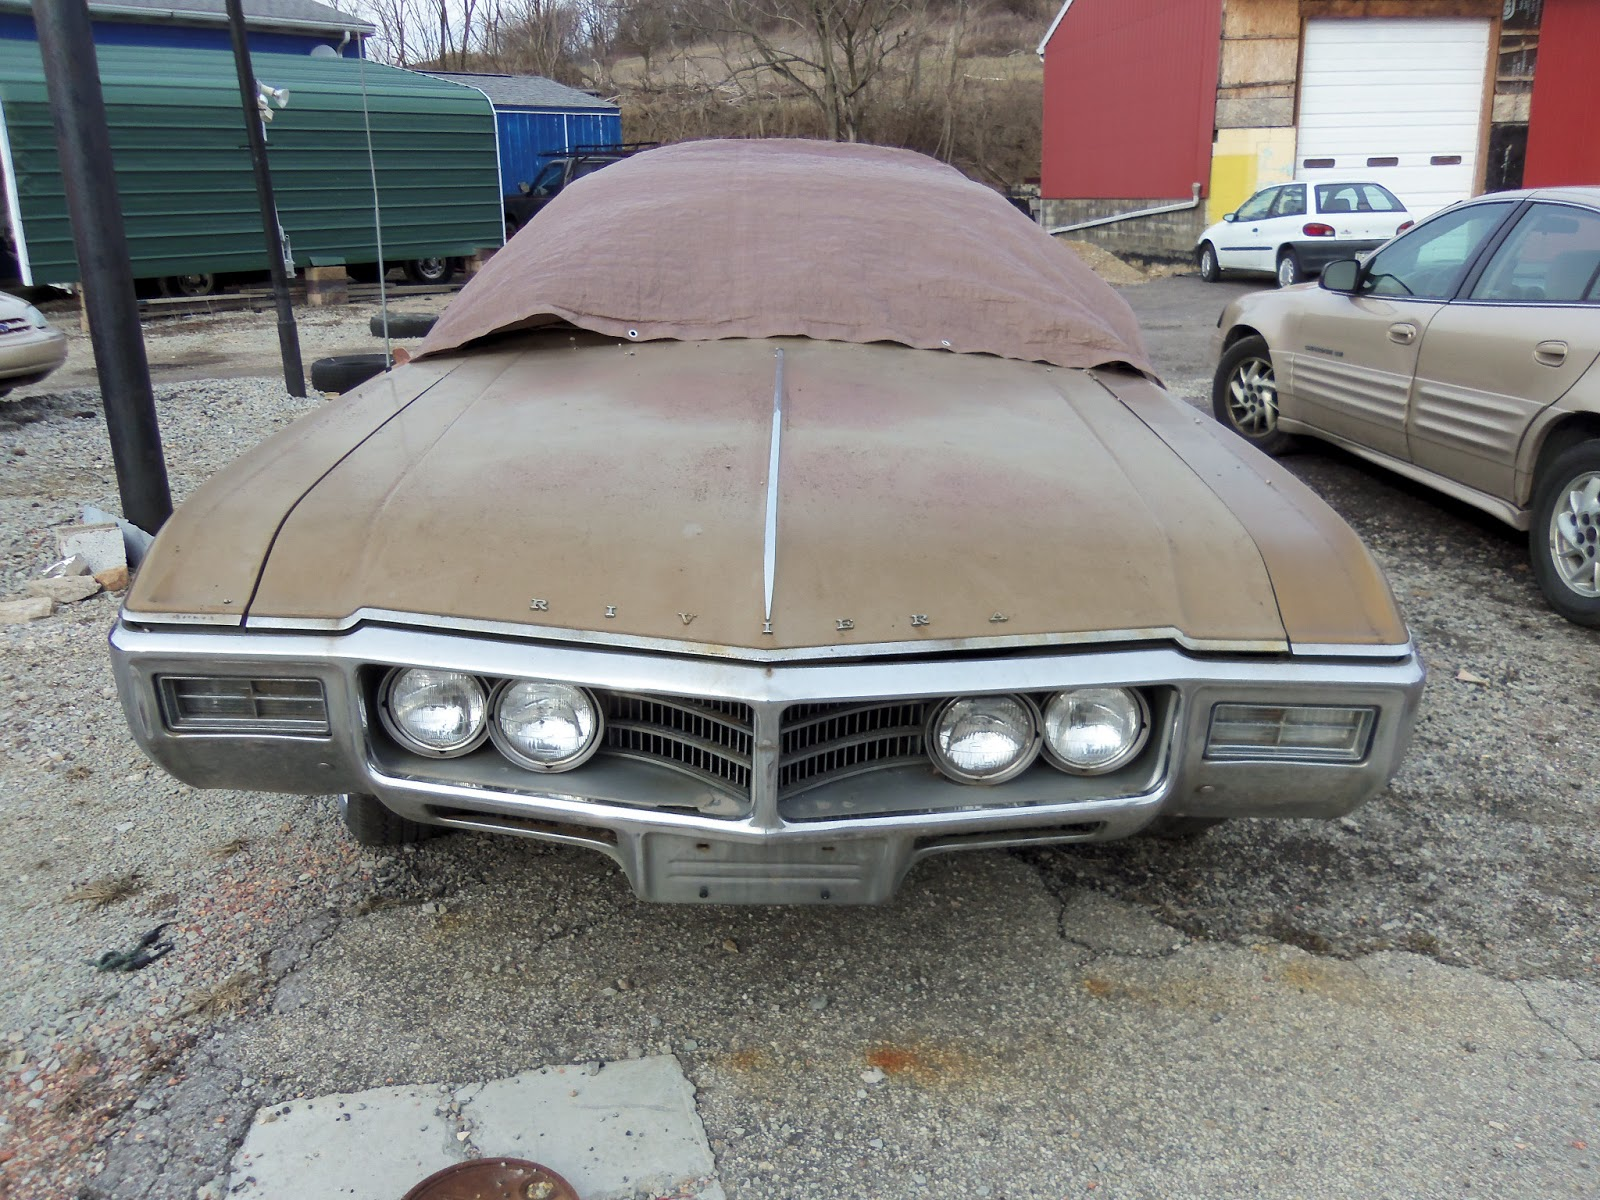 1969 Buick Riviera Gs Craigslist Capture Wayward Cars All Things 1970 Impala For Sale 69 Riv Gran Sport